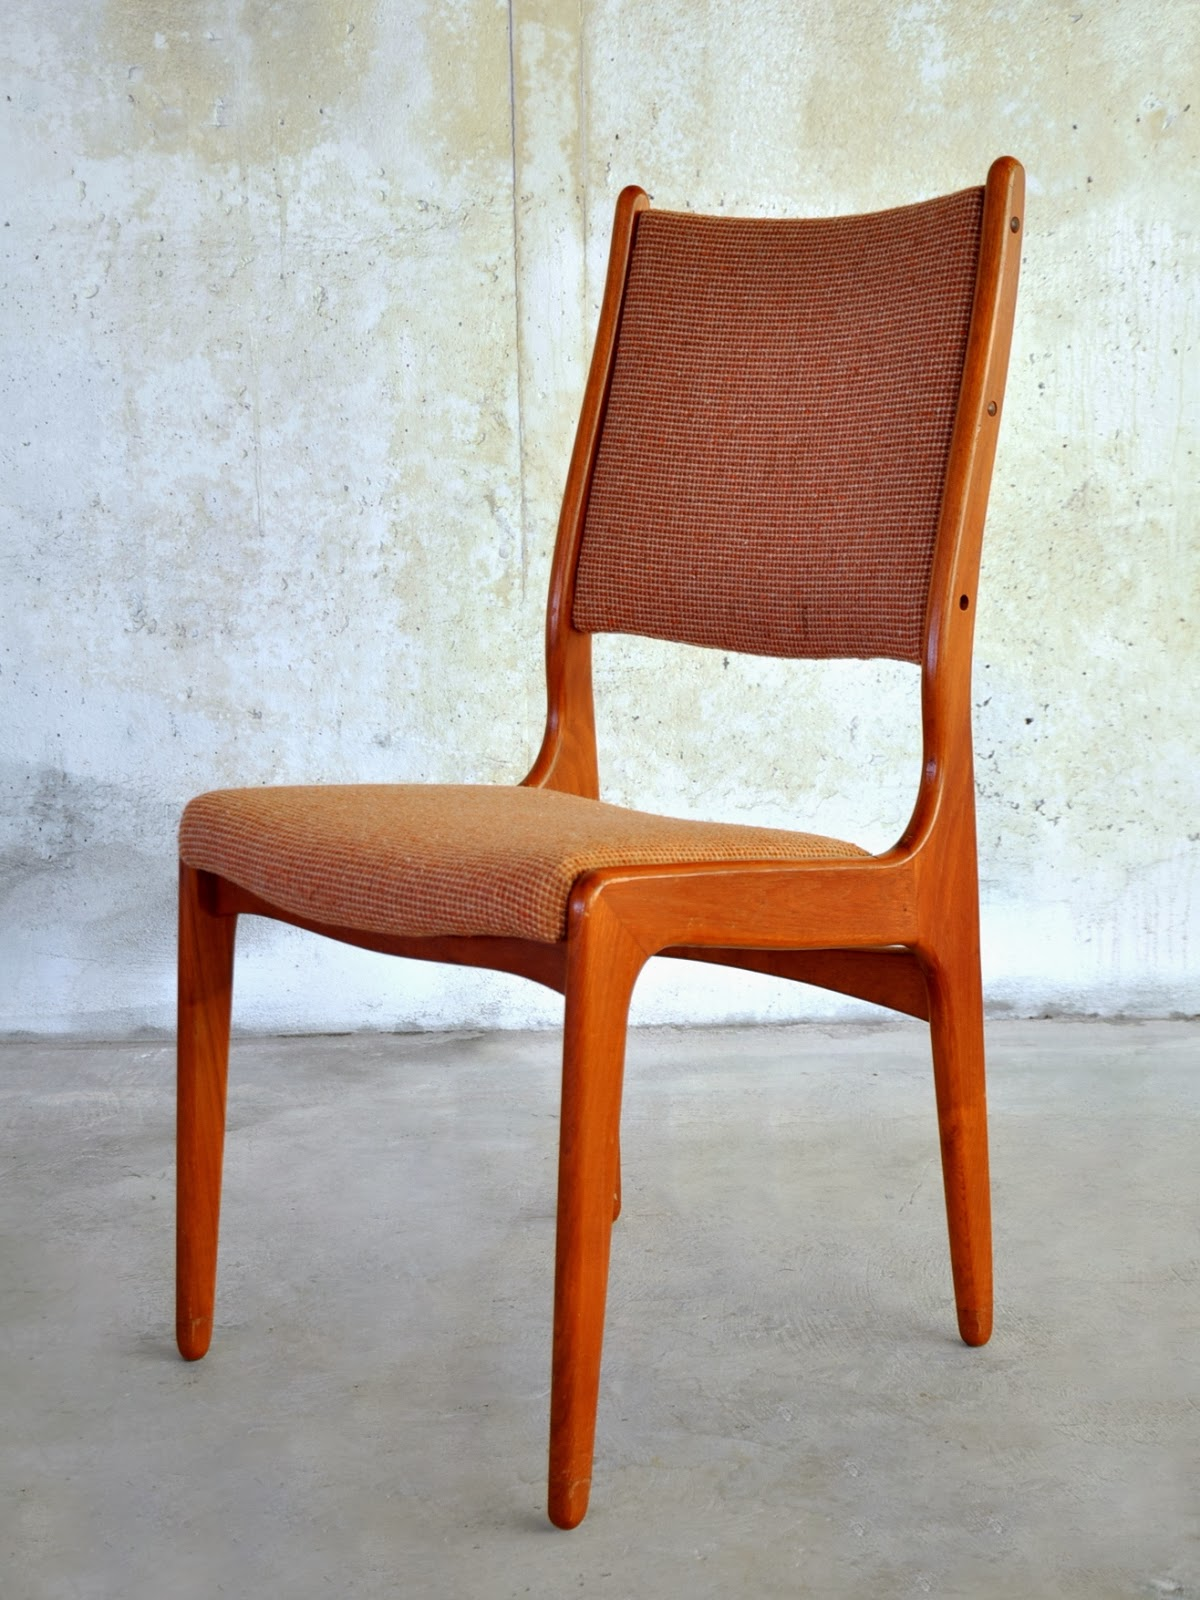 SELECT MODERN: Set of 6 Danish Modern Teak Dining Chairs